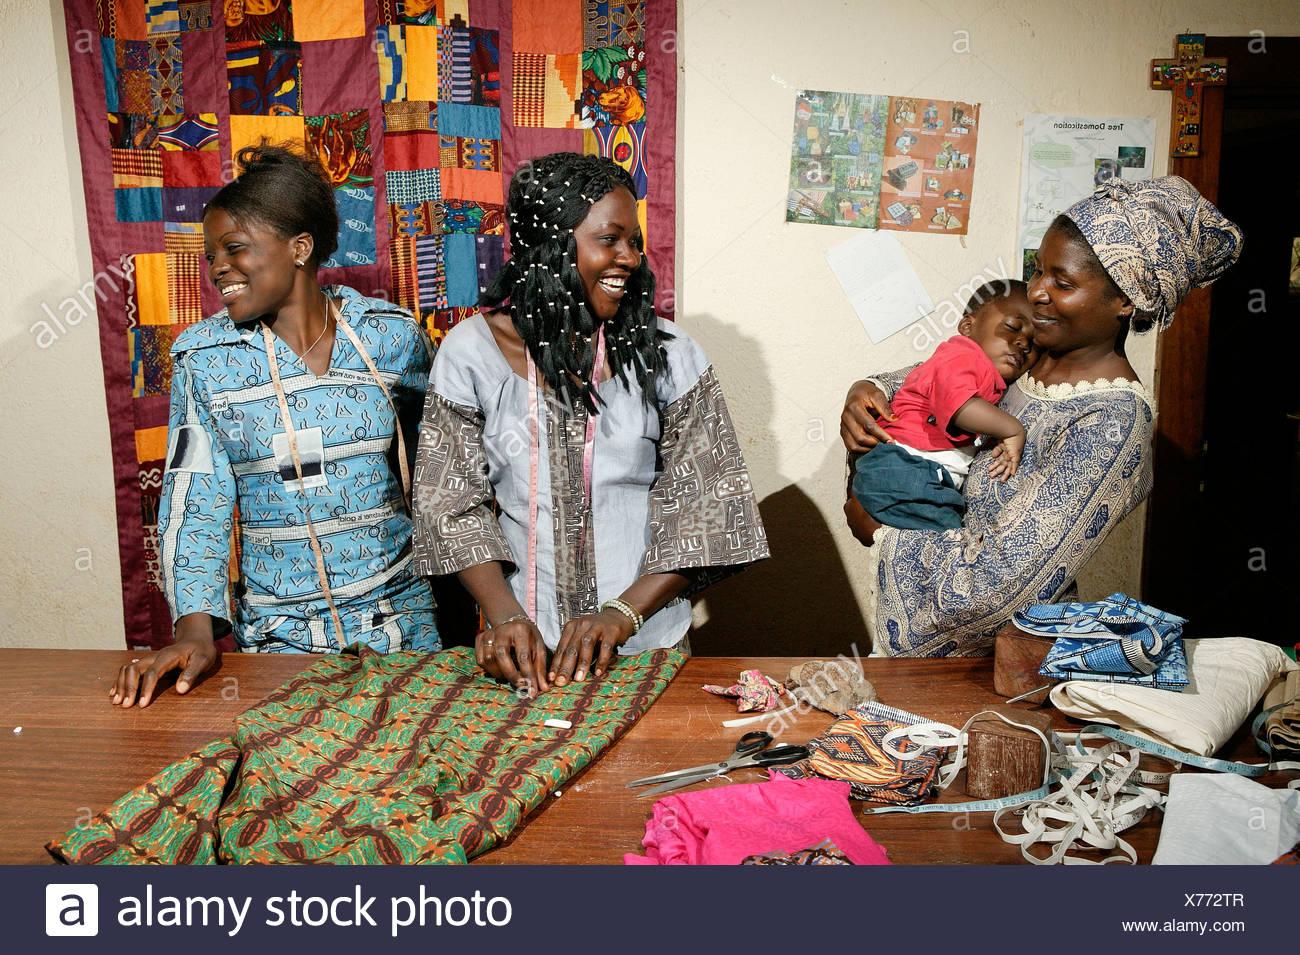 Tailors, seamstresses of an HIV help group, Bafut, Cameroun, Africa - Stock Image